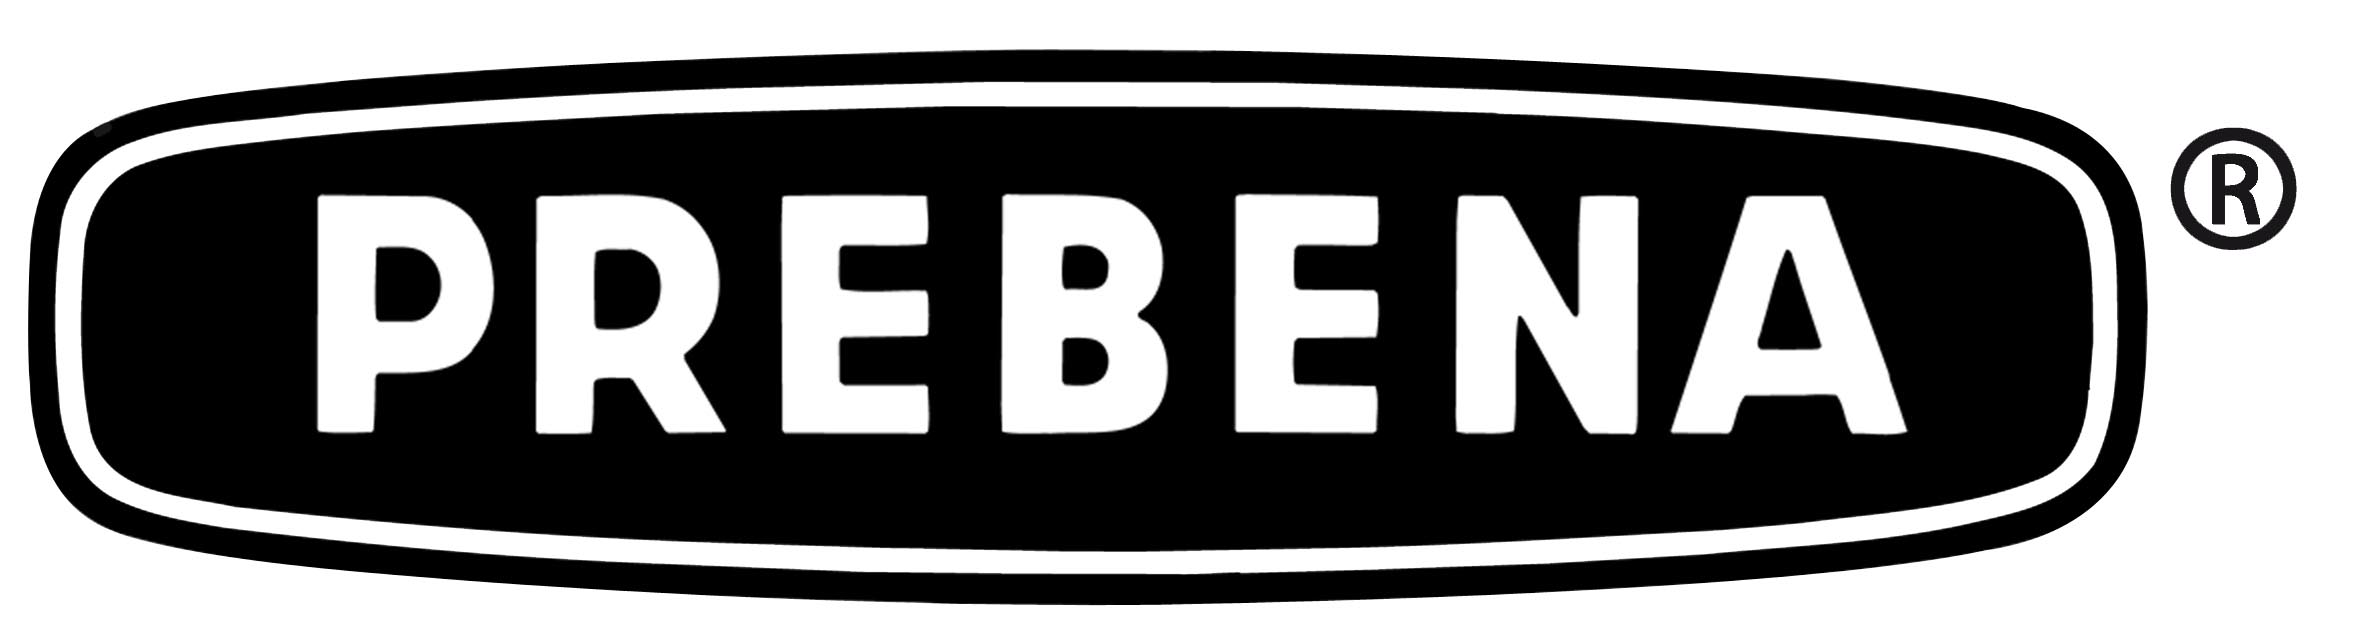 prebena logo